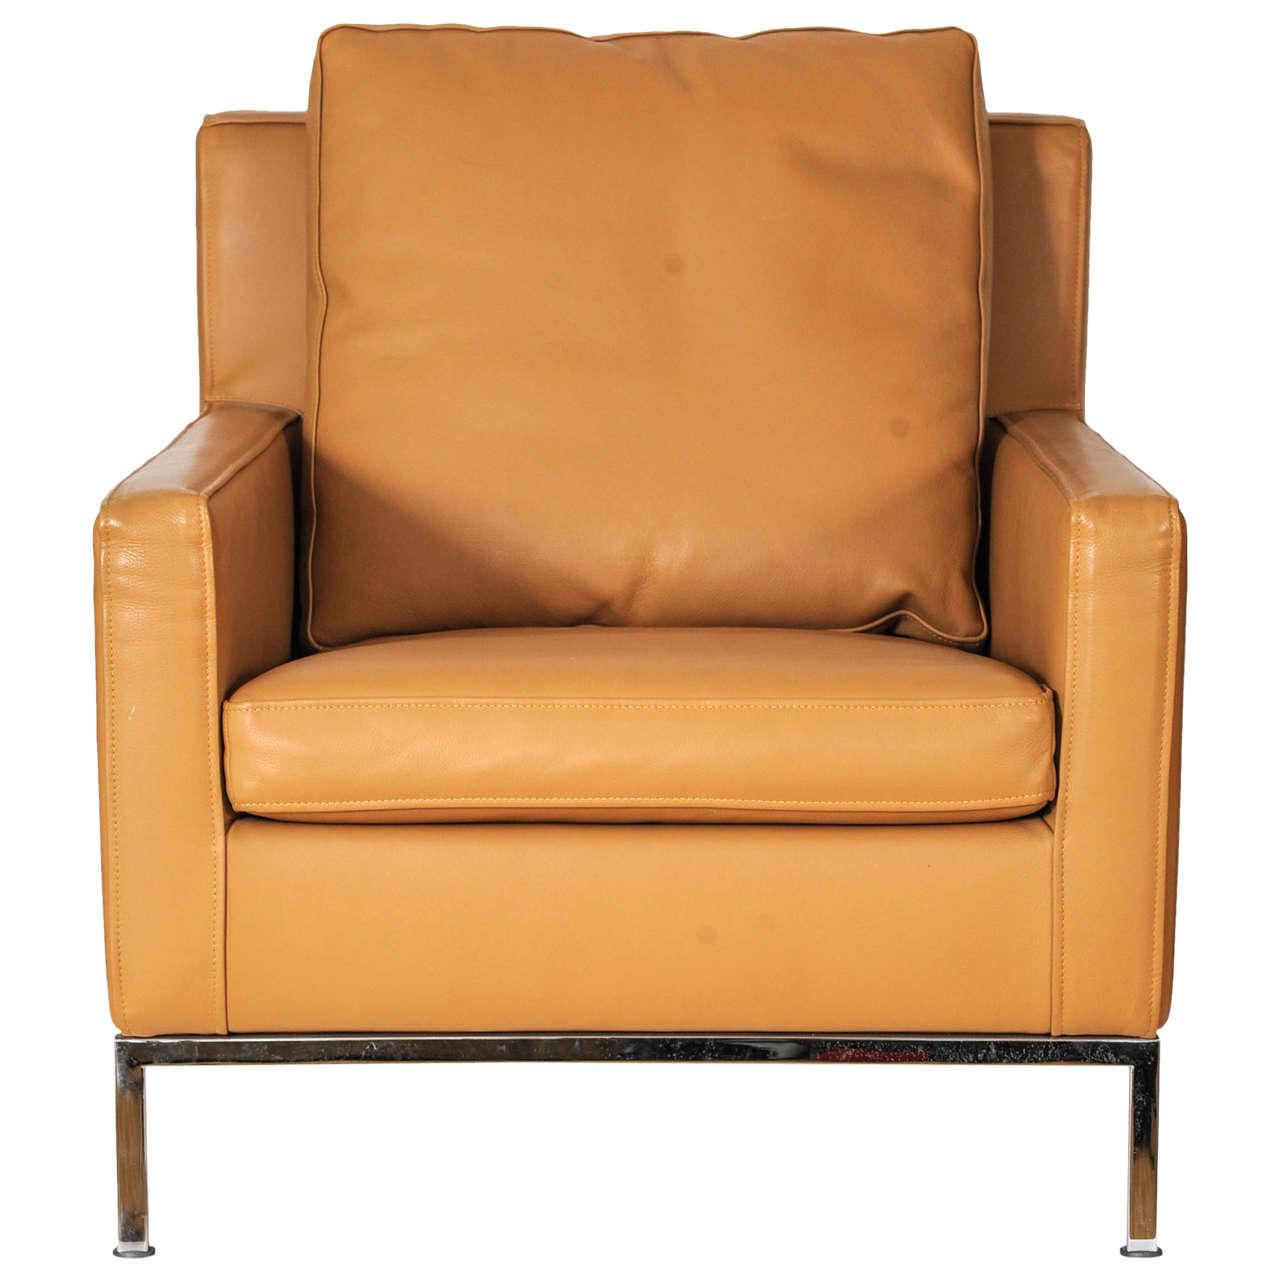 Easy Chair Bohémien by Emaf Progetti for Zanotta